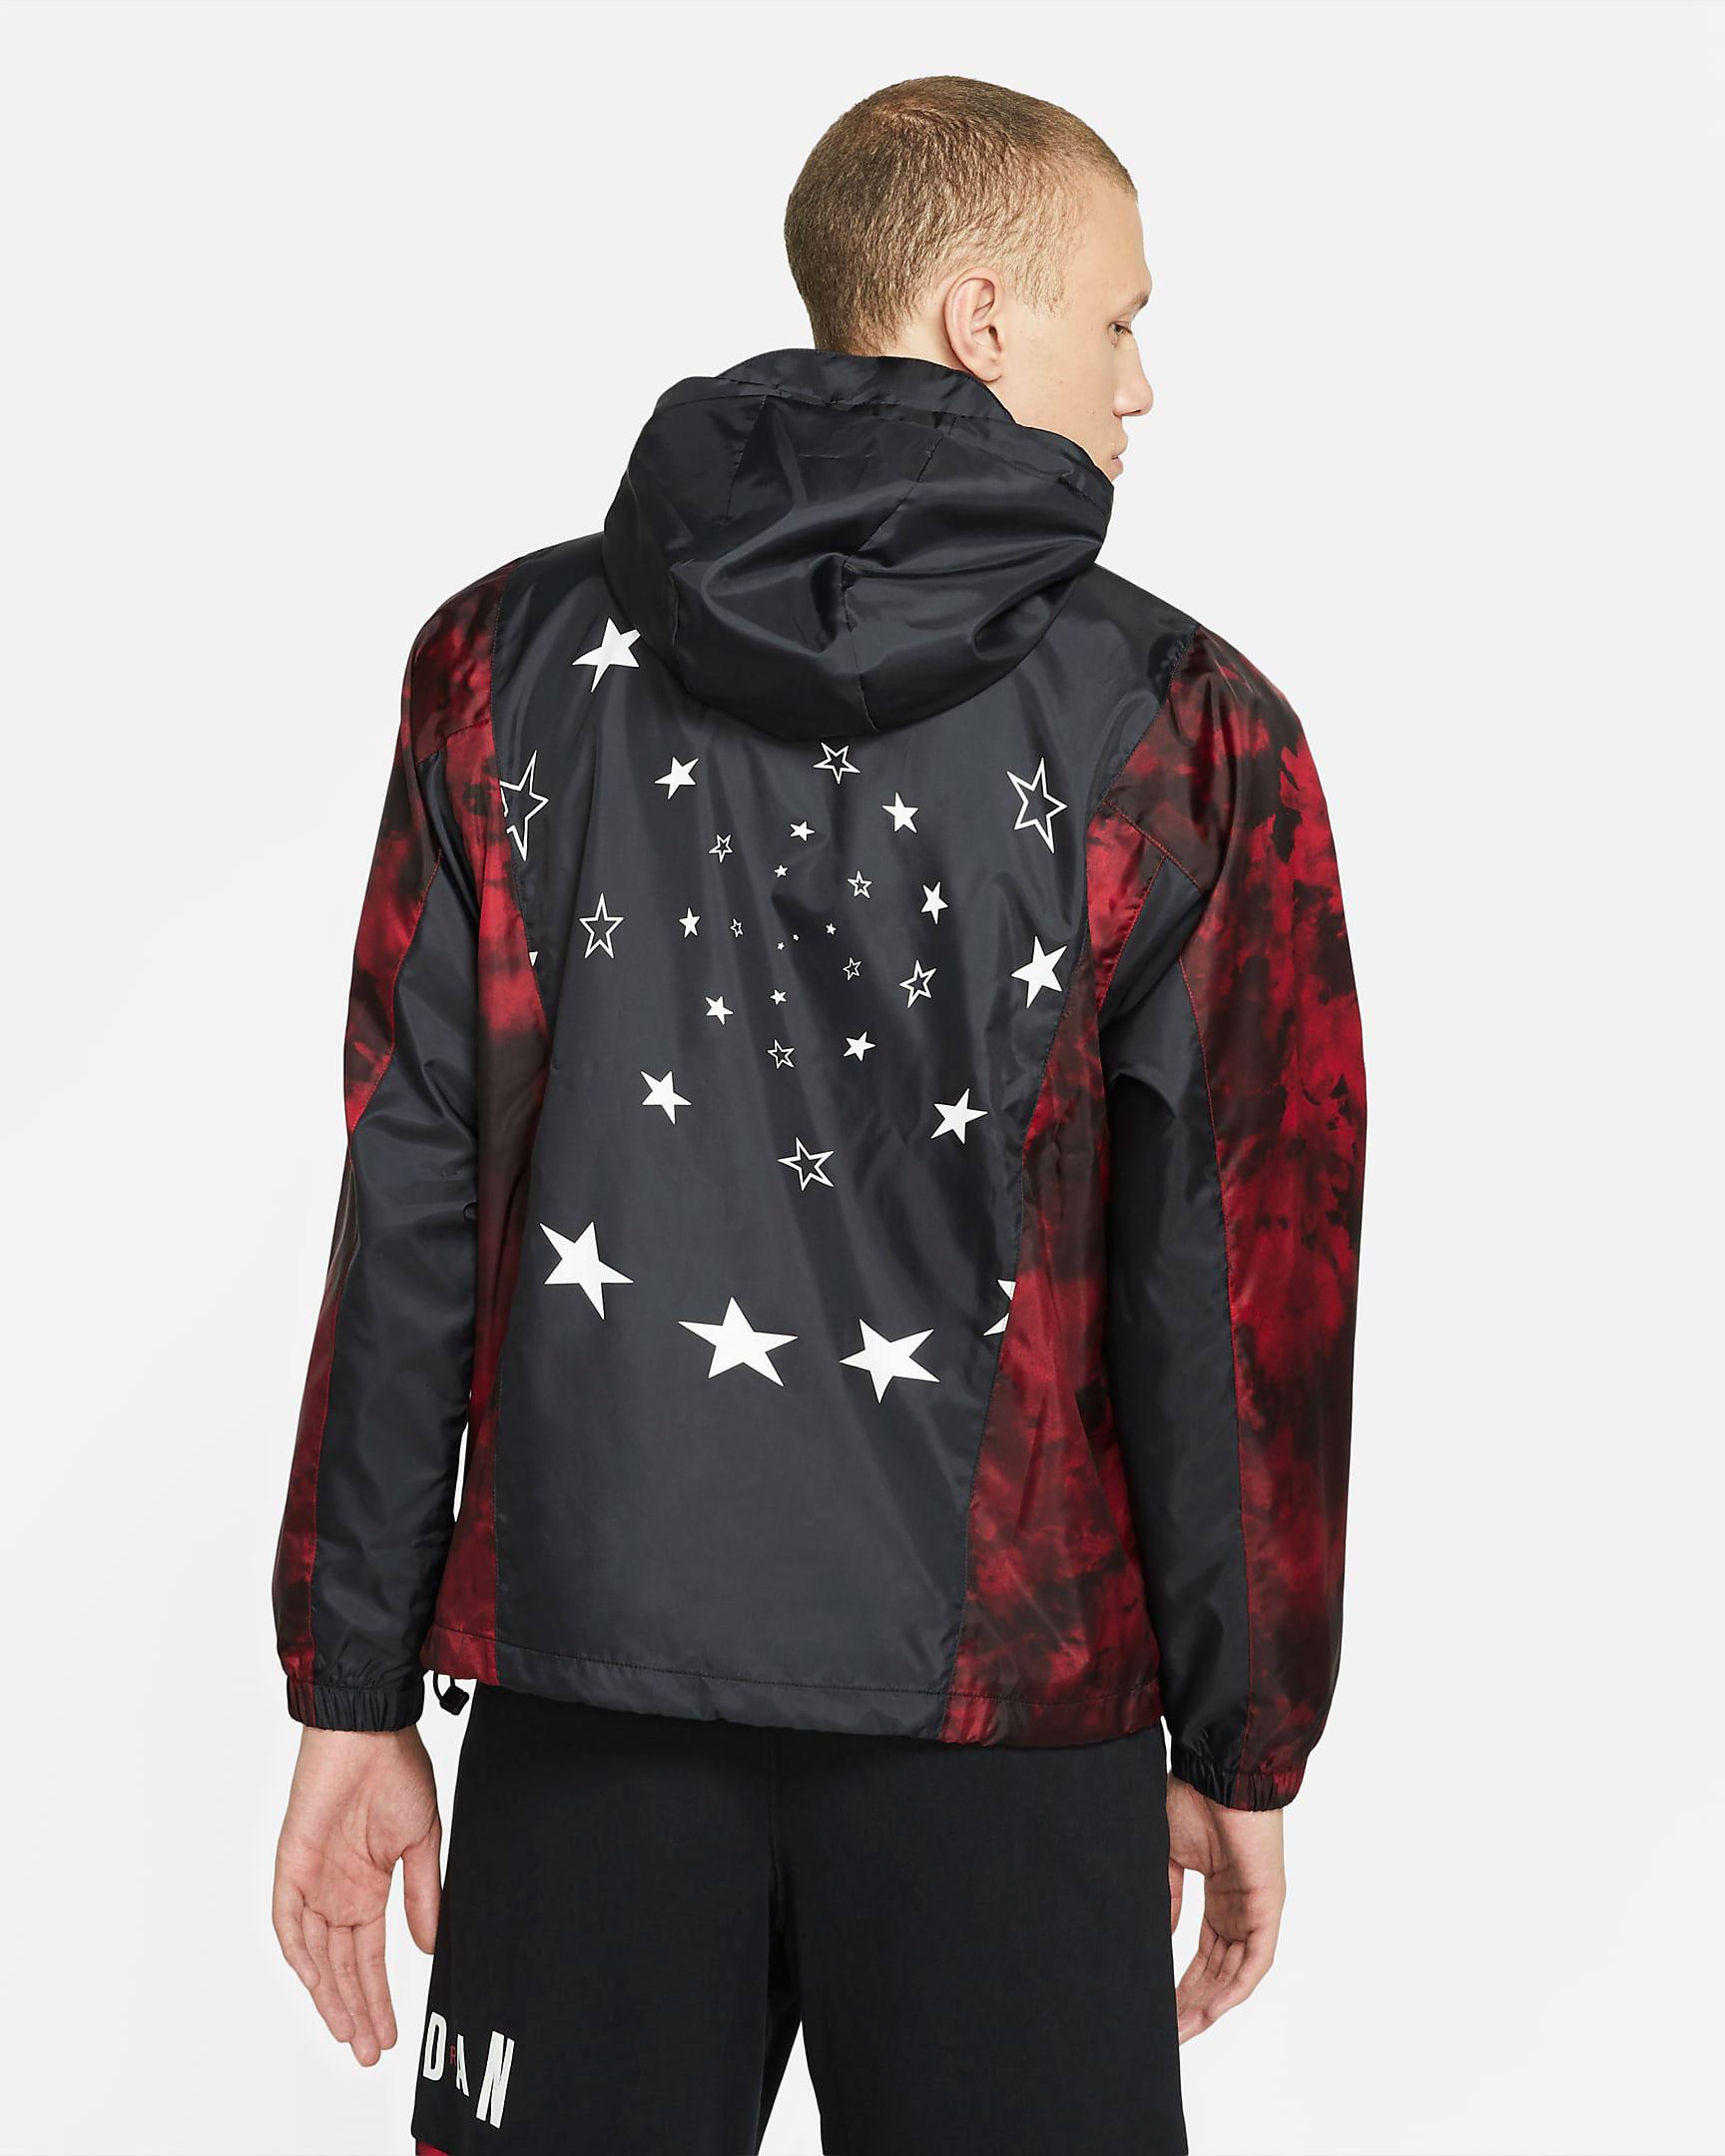 carmine-jordan-6-jacket-2